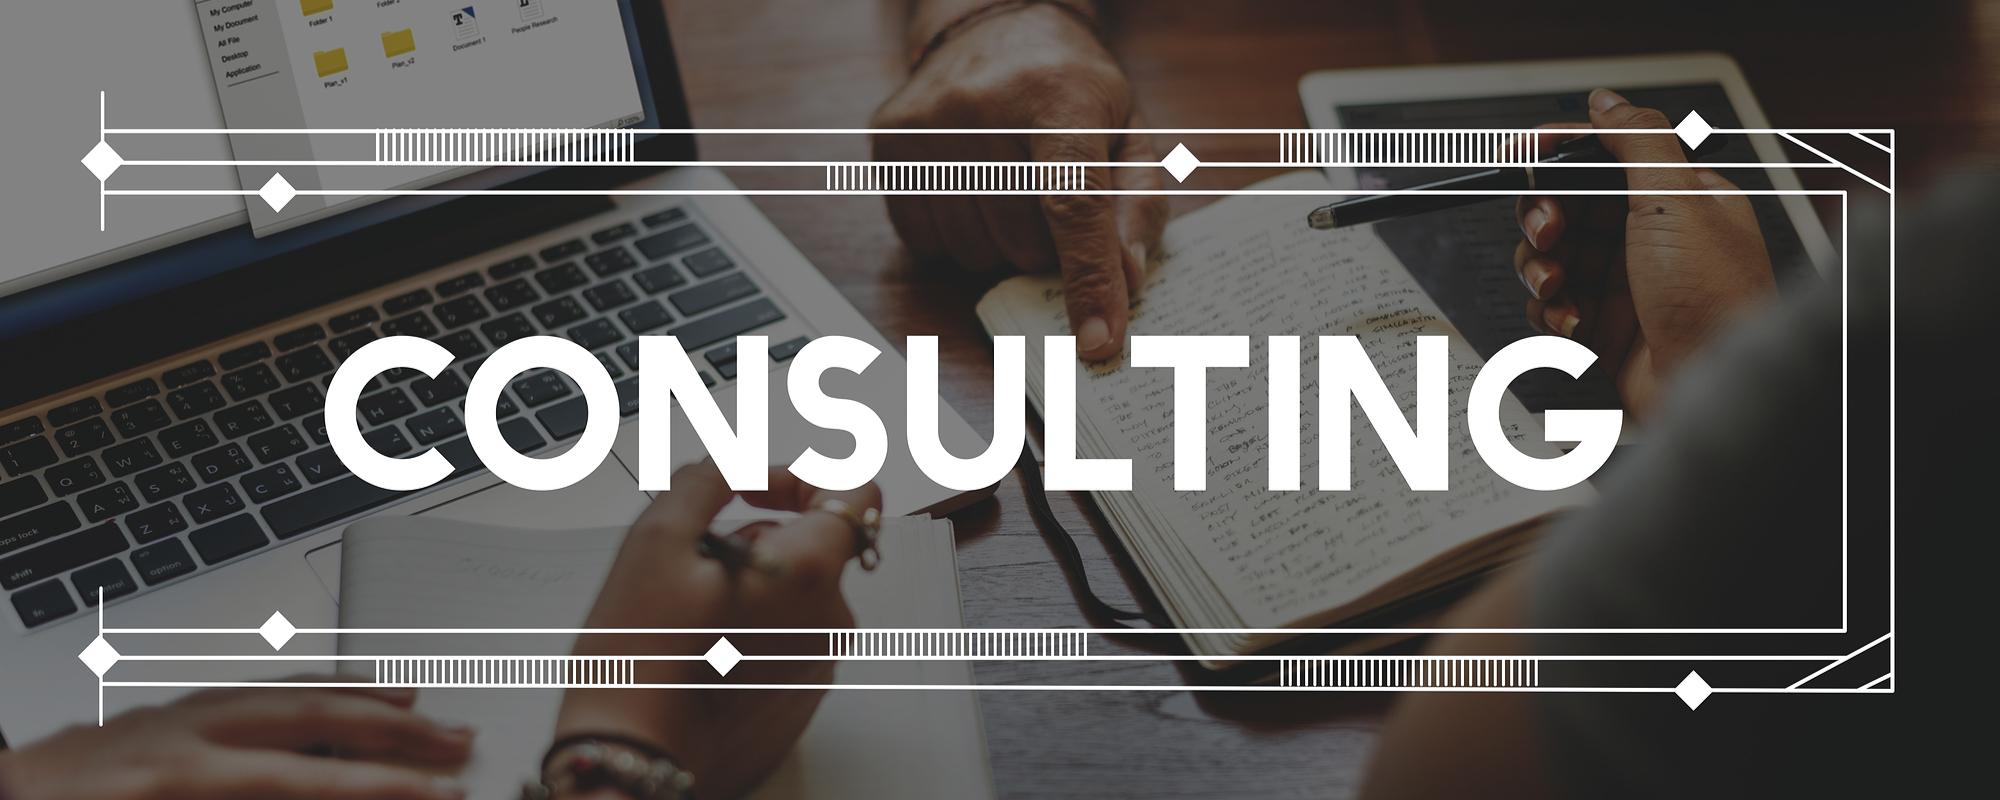 Konsulentbranchen, konsulent, konsulentarbejde